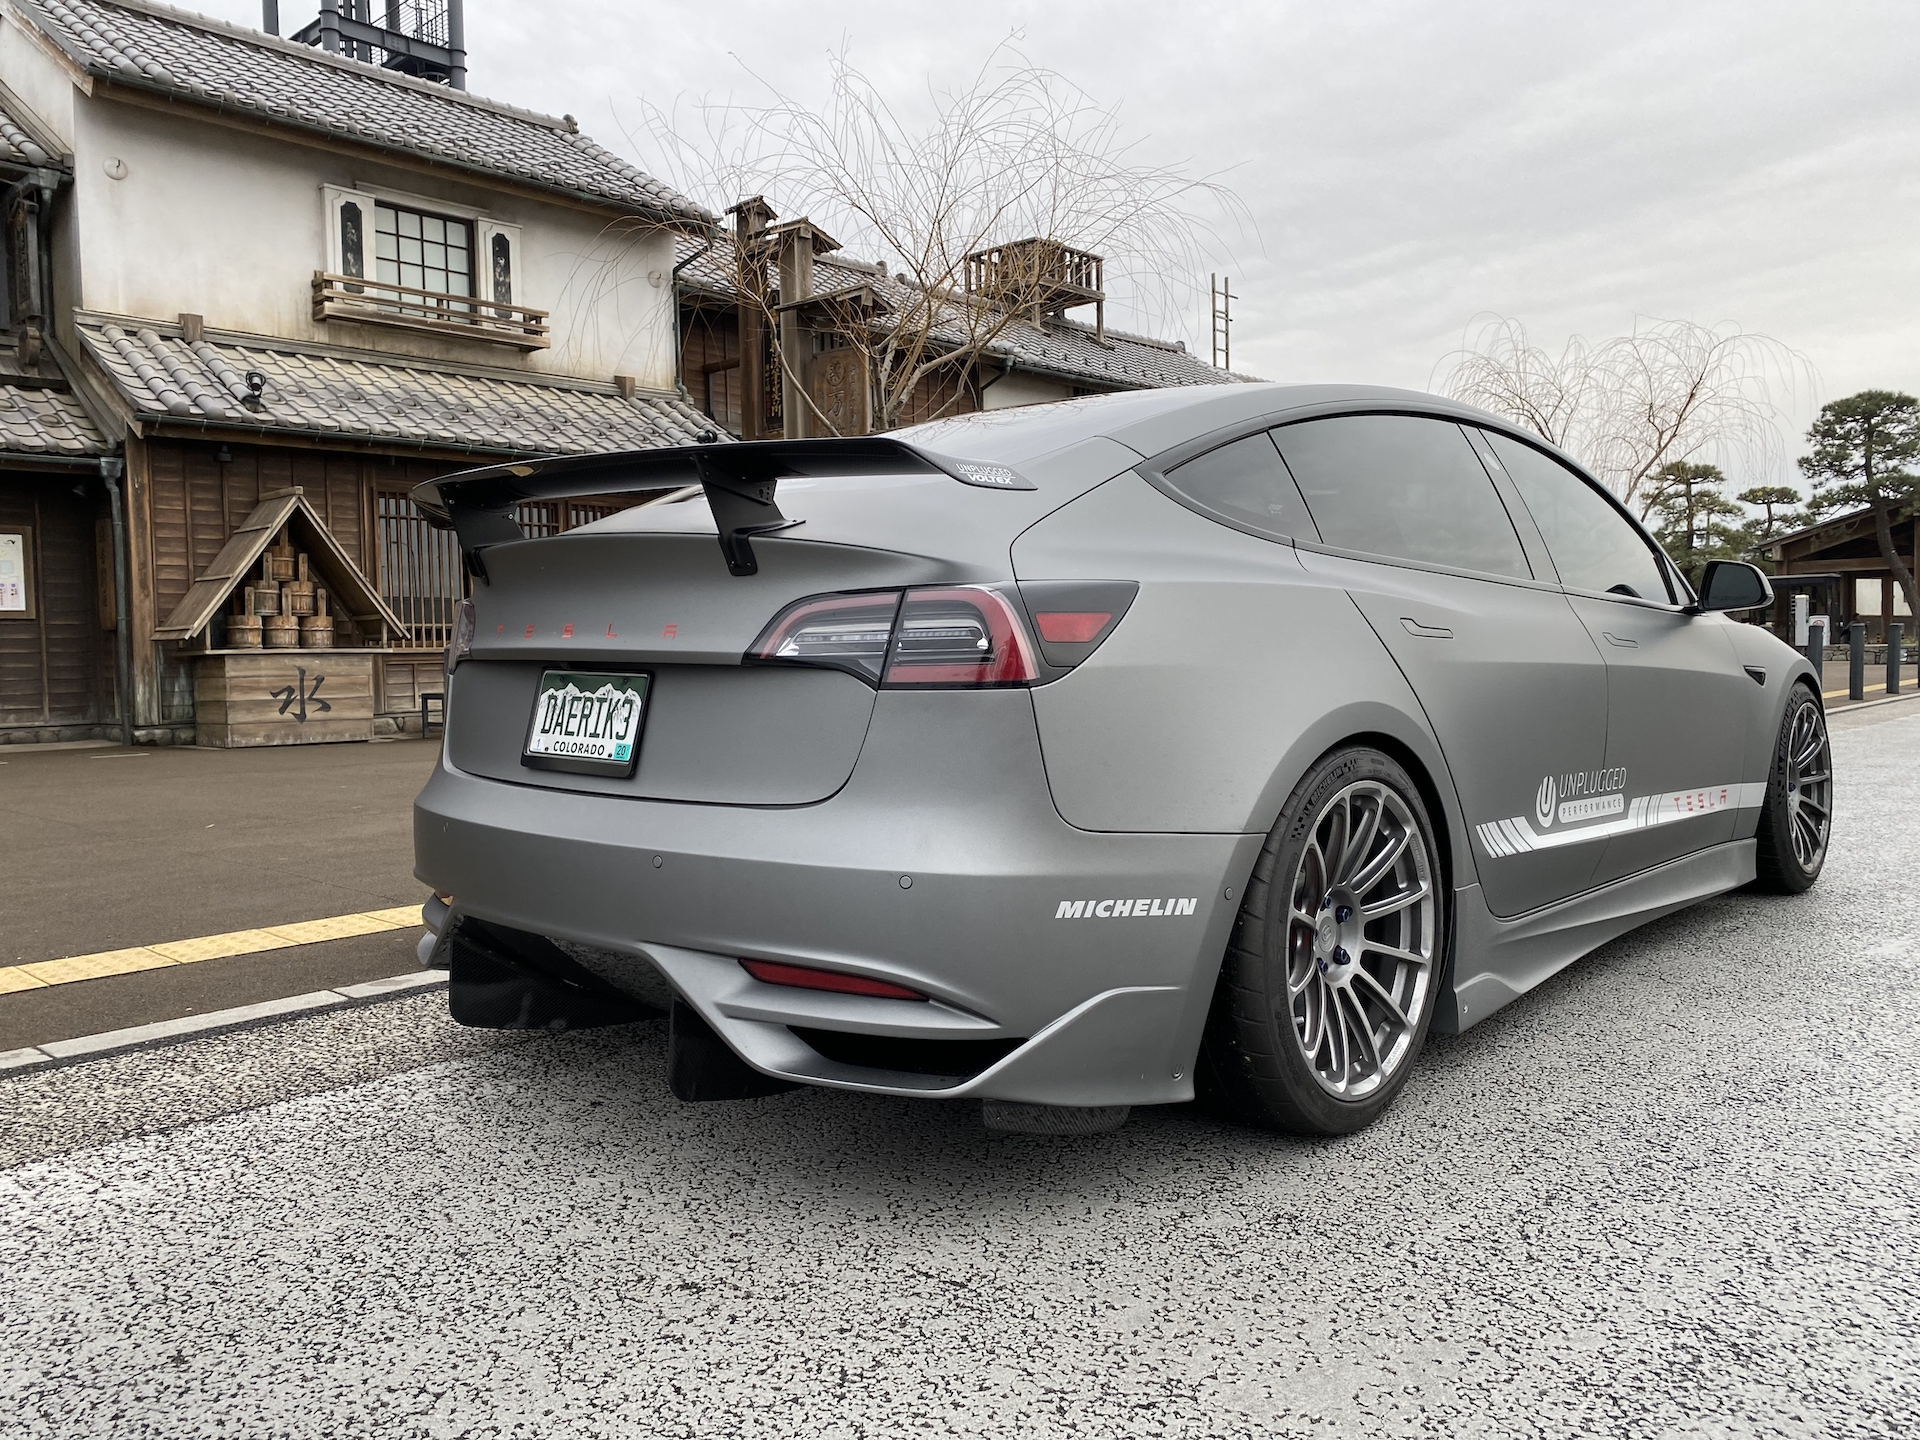 Tesla Model 3 Ascension-R rear spoiler, Japan (Source: Unplugged Performance)